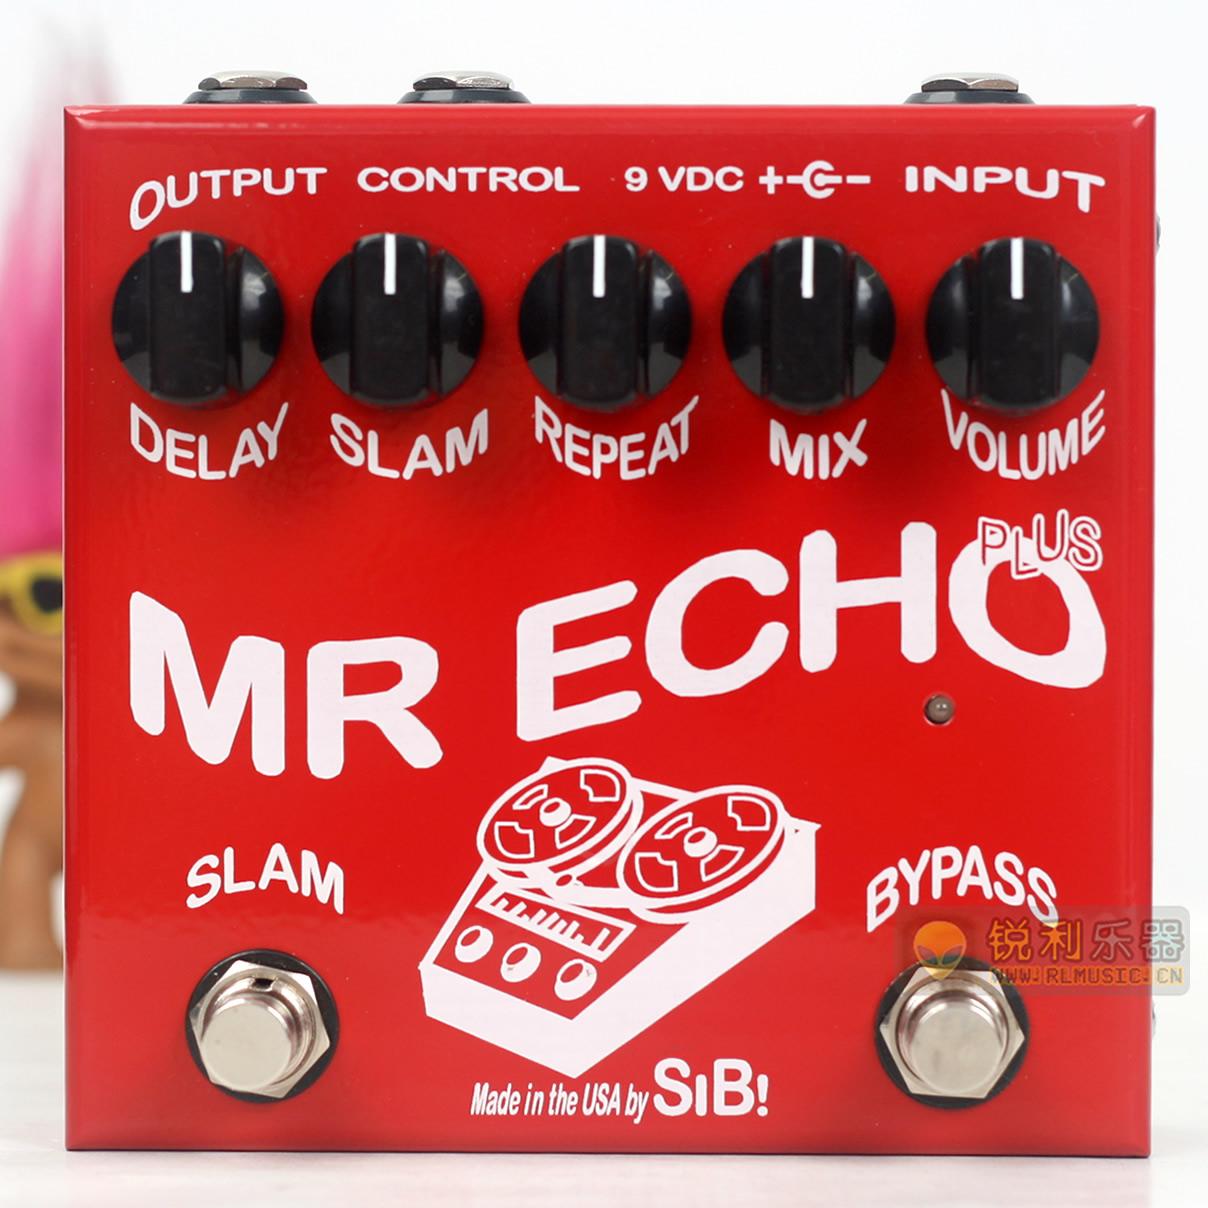 【SIB Mr Echo Plus】模拟回响延迟延时效果器加强版【锐利乐器】